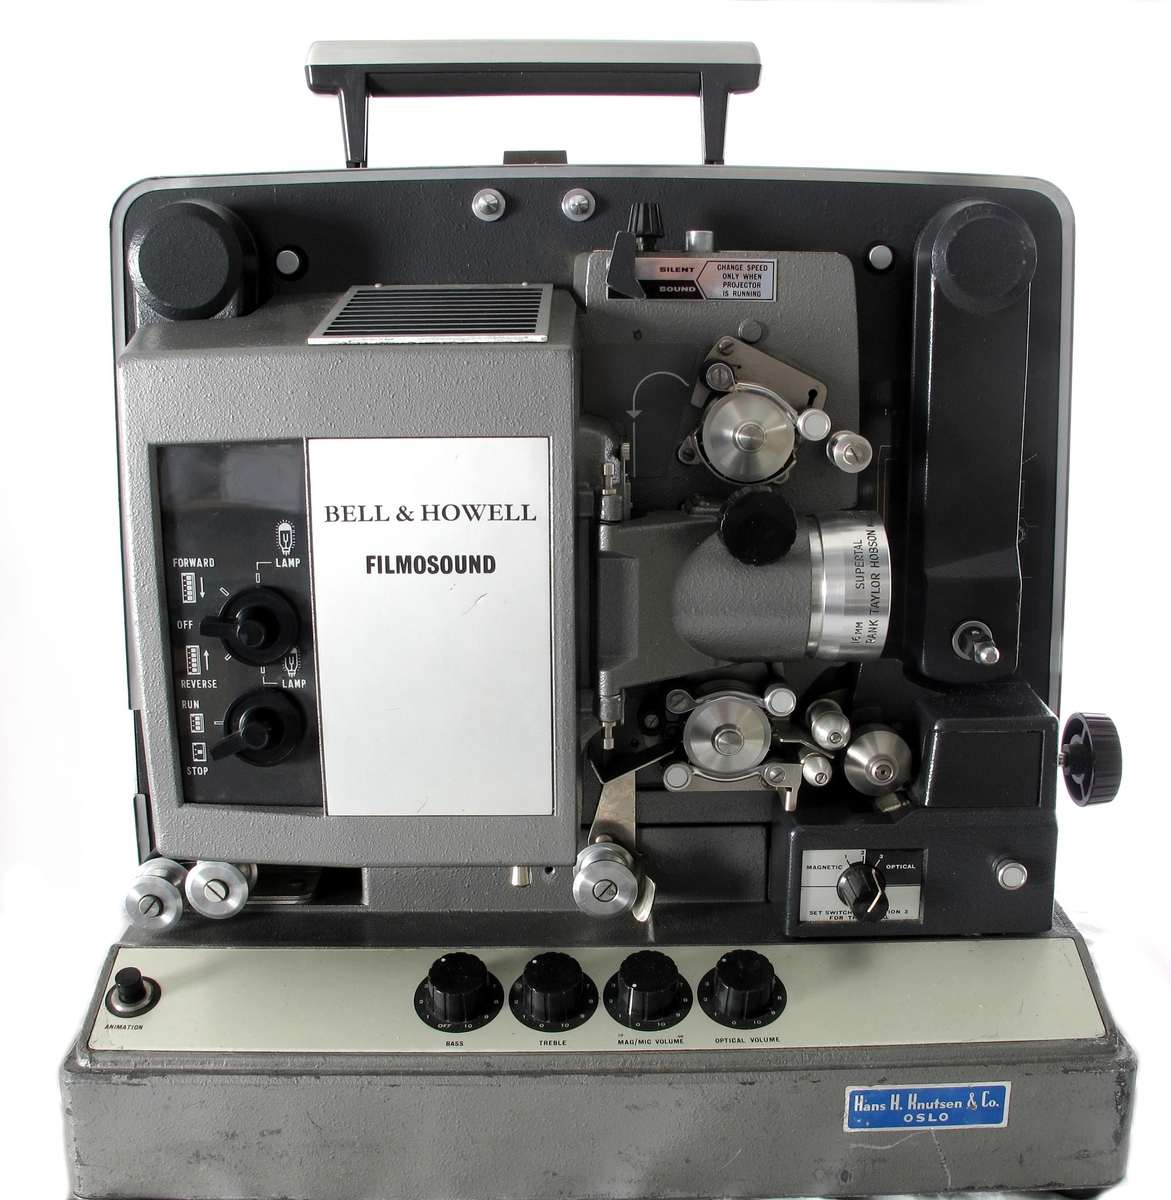 Filmfremviserapparat i koffert.